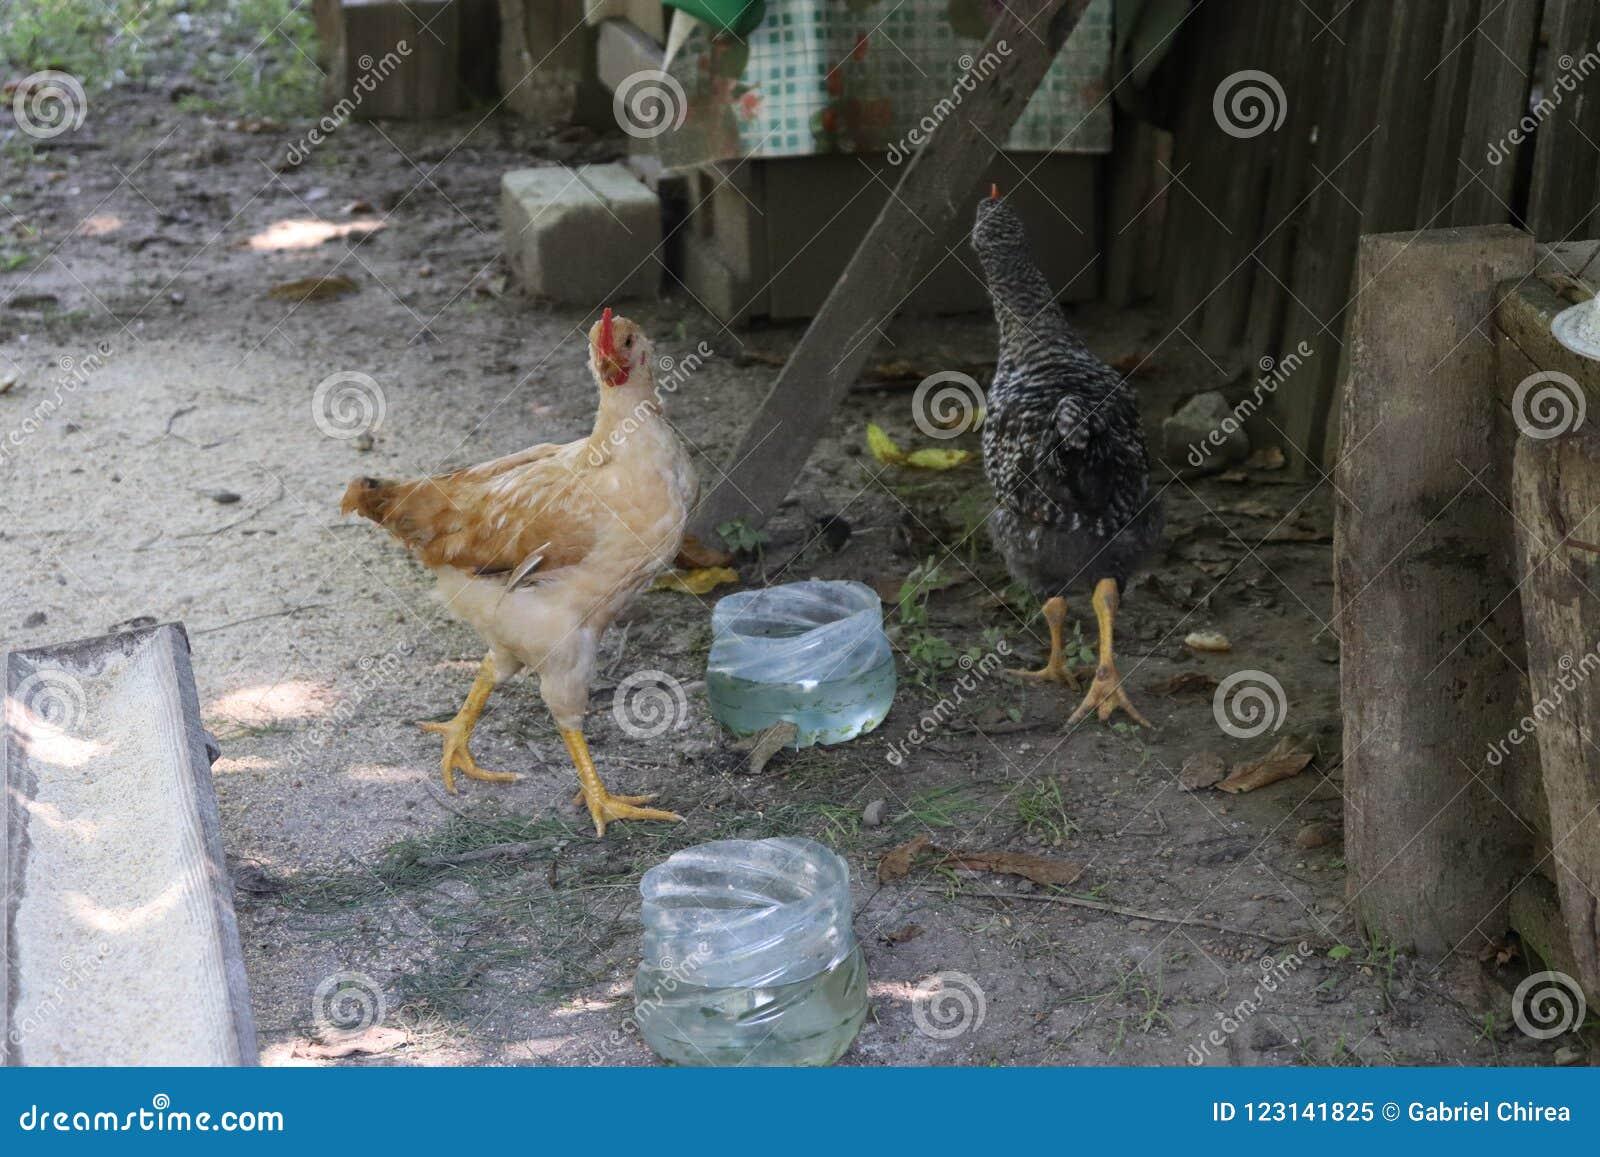 Chickens raised in an organic farm